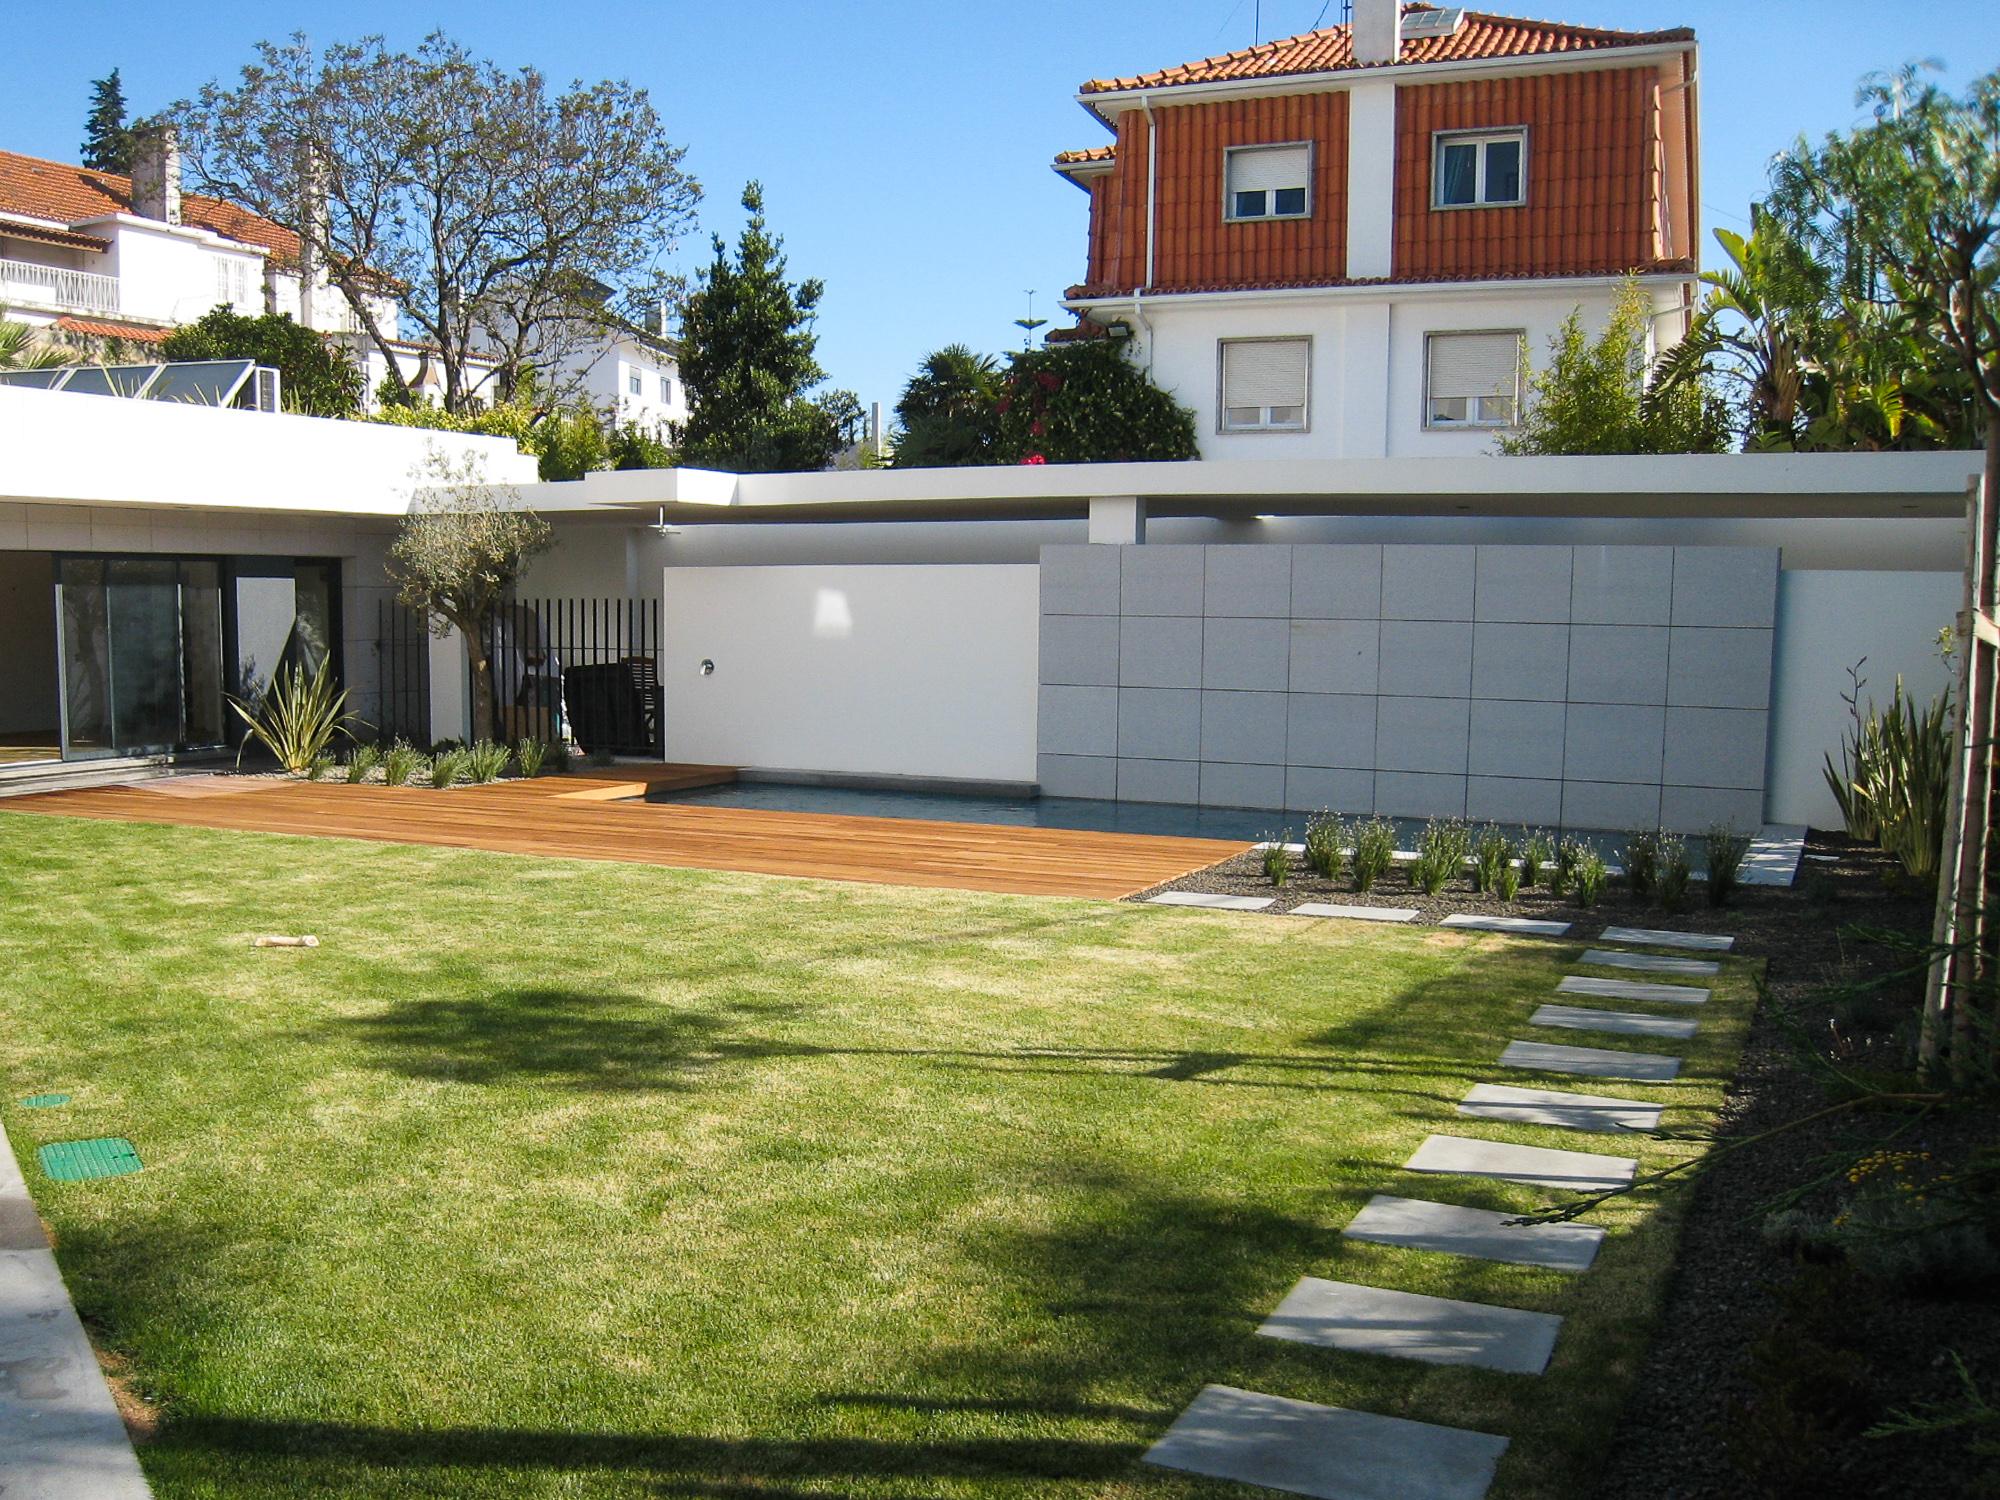 lisboa - Alvalade